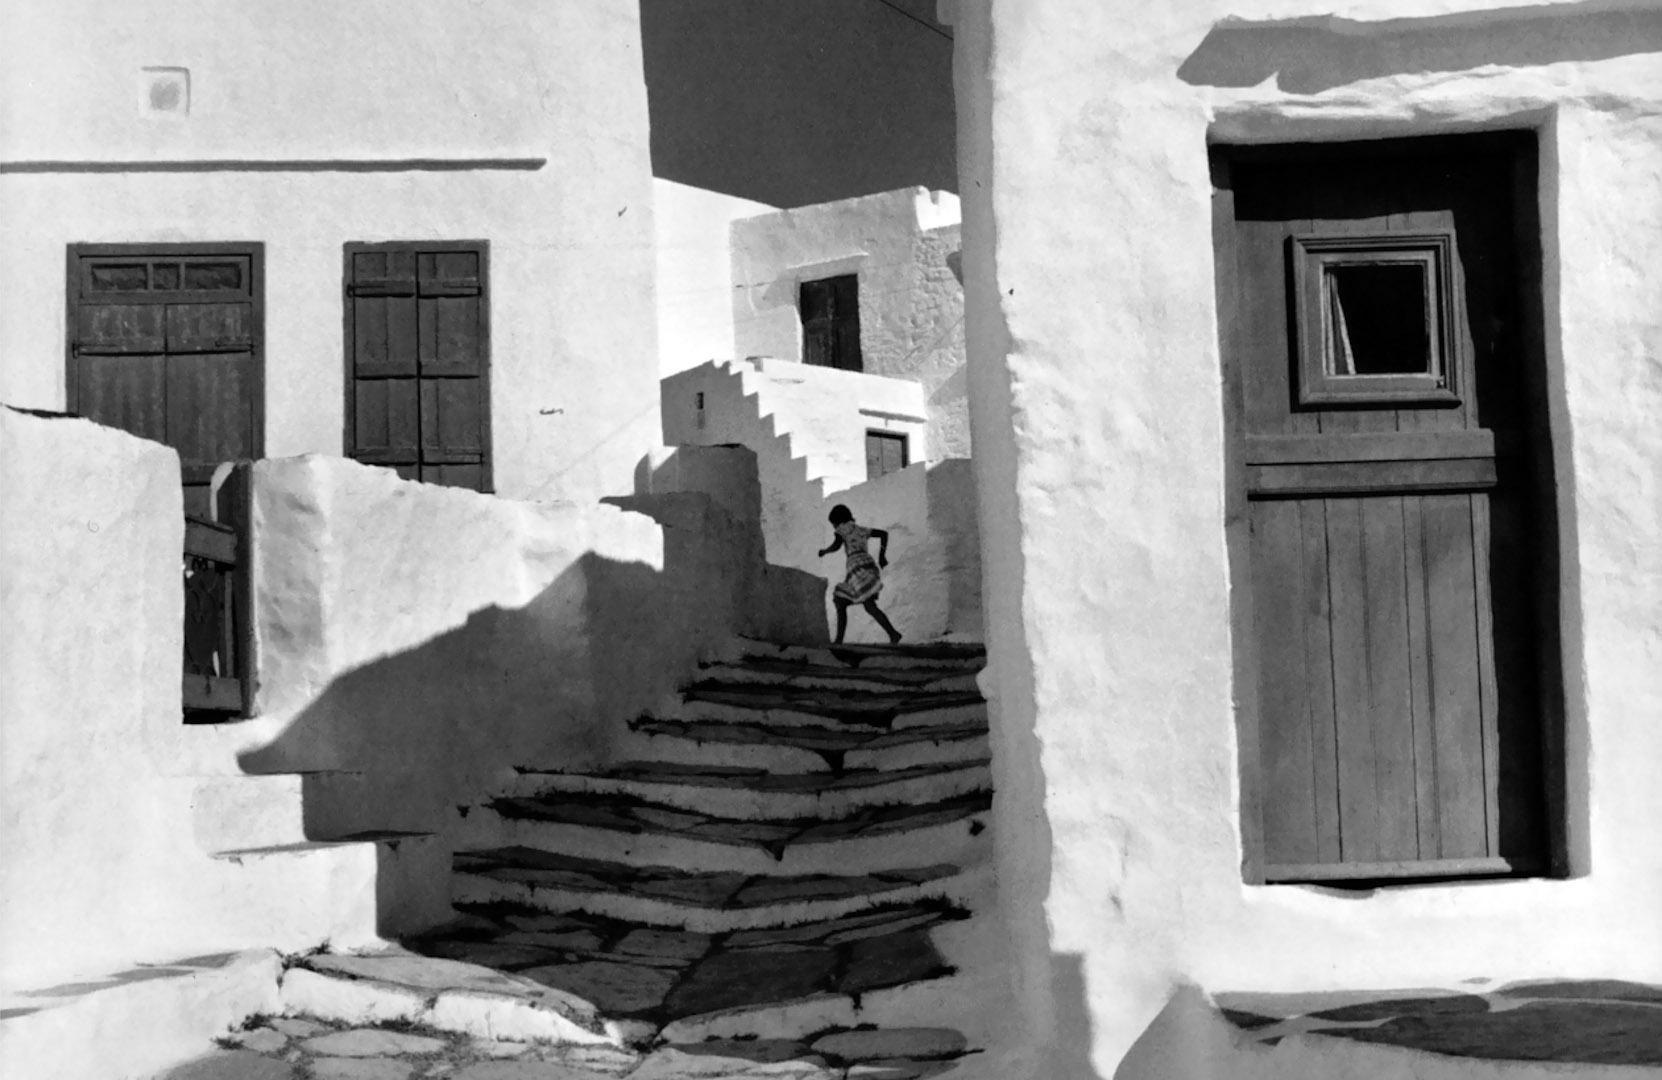 ddbba1c5774 Henri Cartier Bresson - Elvira Photography